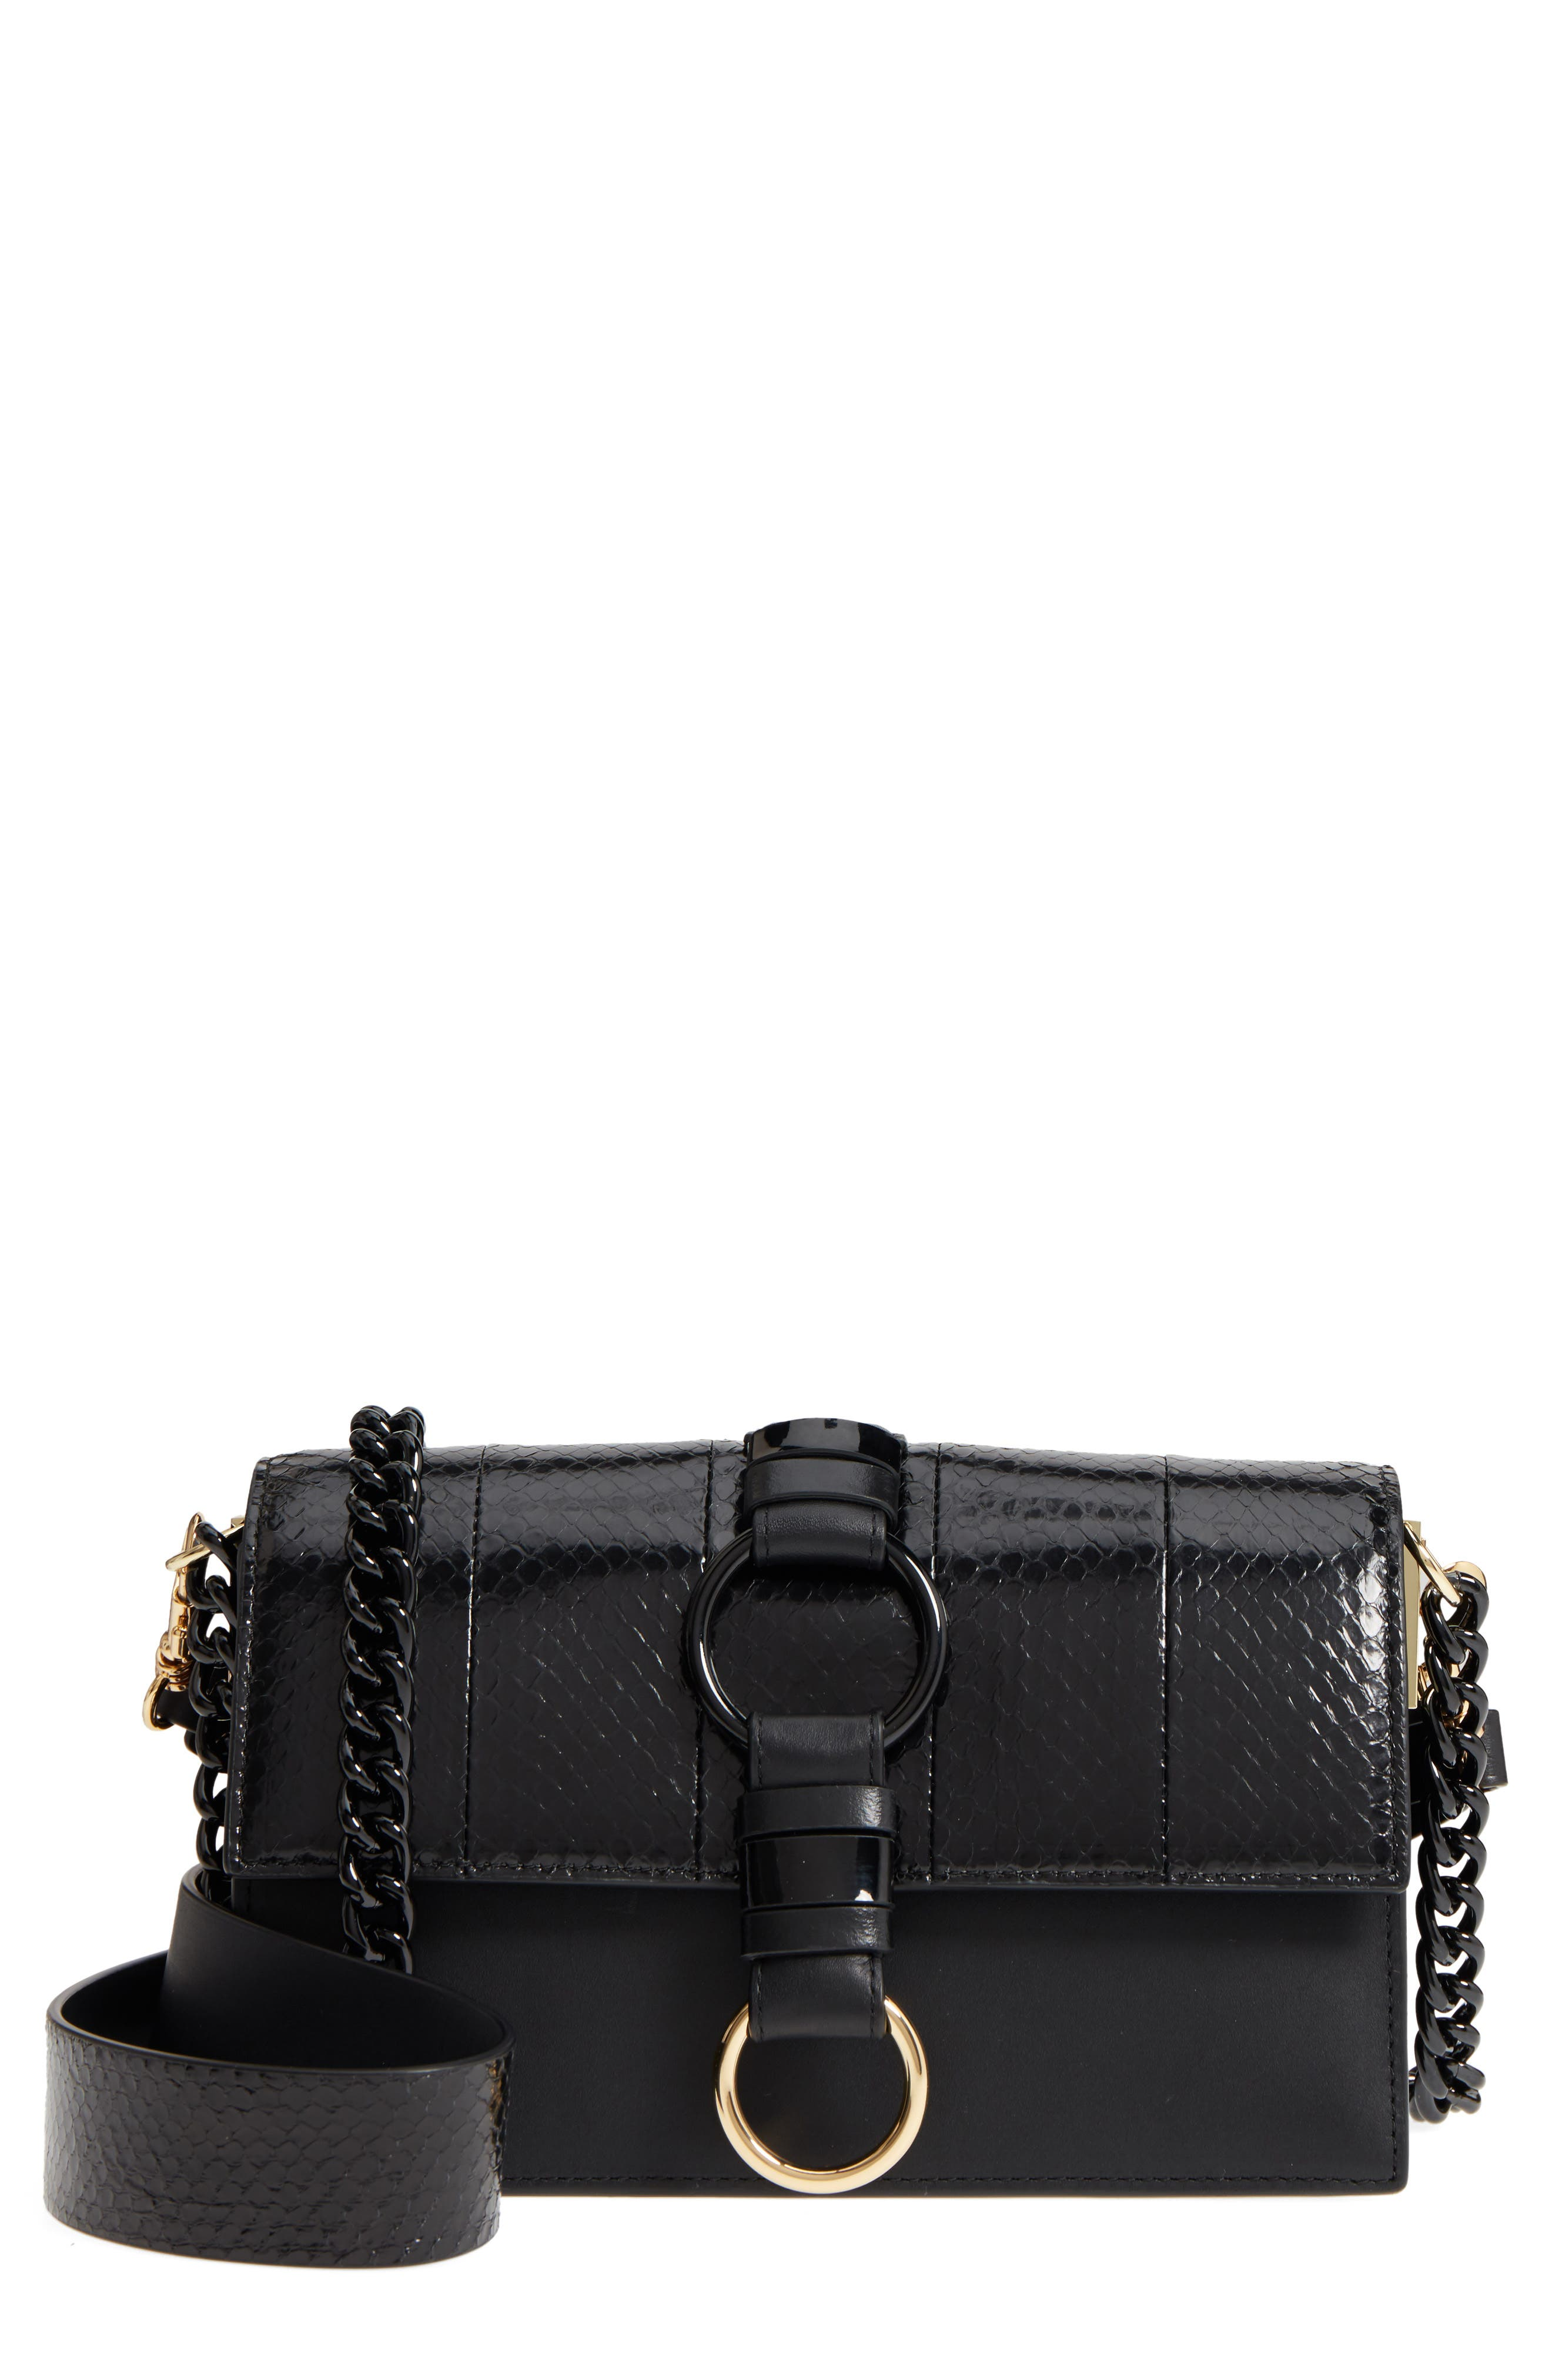 Bonne Journée Leather & Genuine Snakeskin Crossbody Bag,                             Main thumbnail 1, color,                             Black